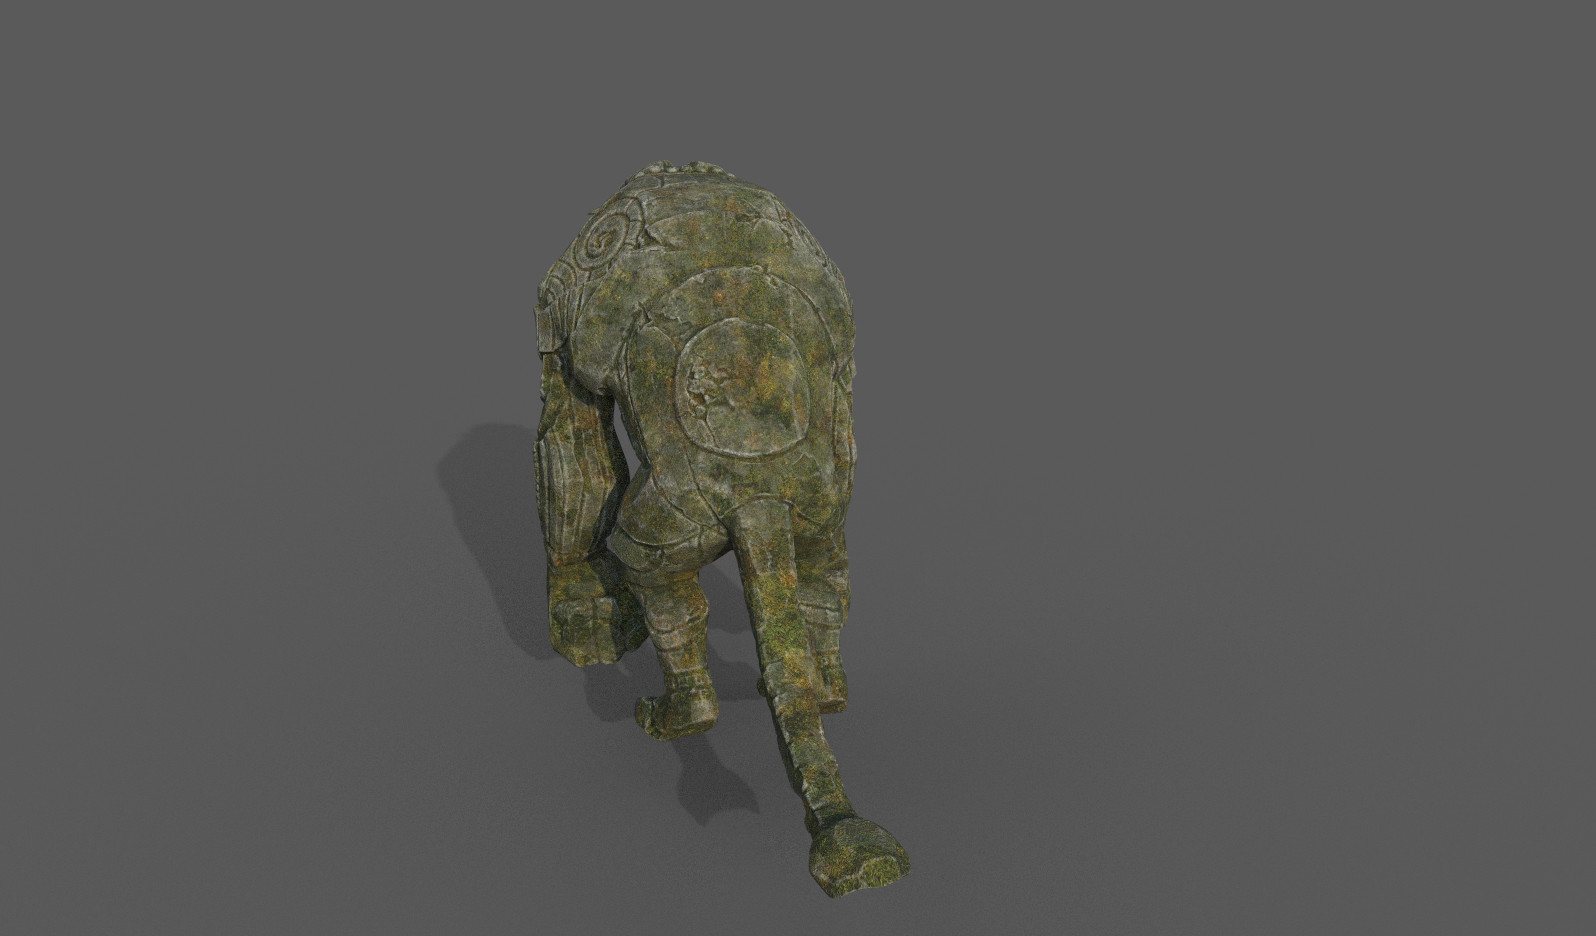 Darko mitev beast statuev2 03